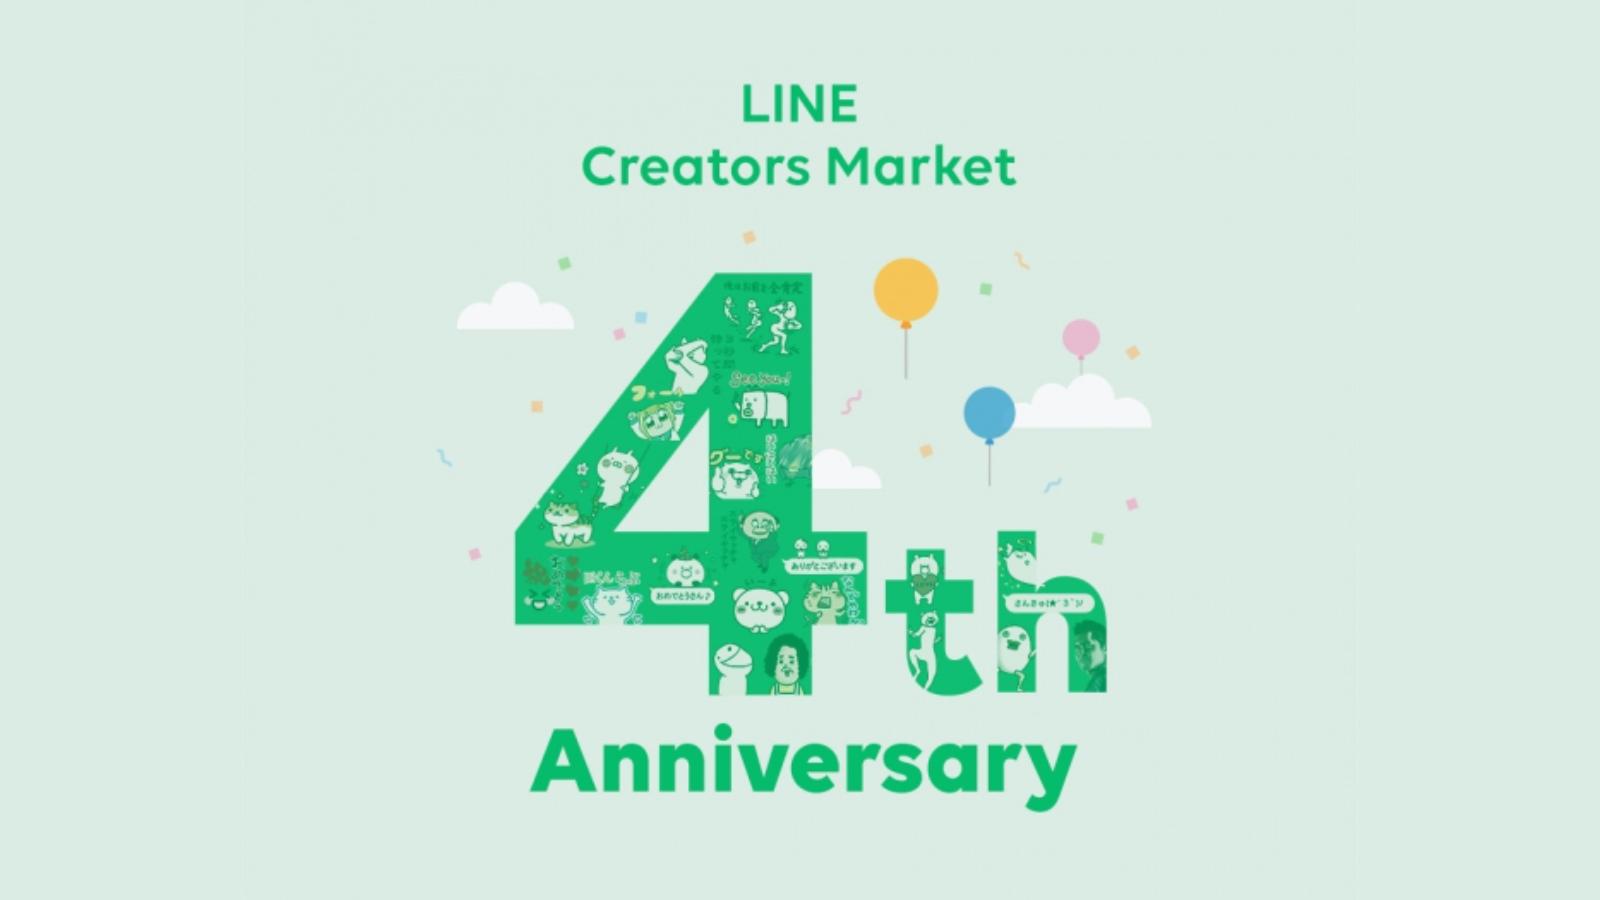 Line Creators Market 4th anniversary